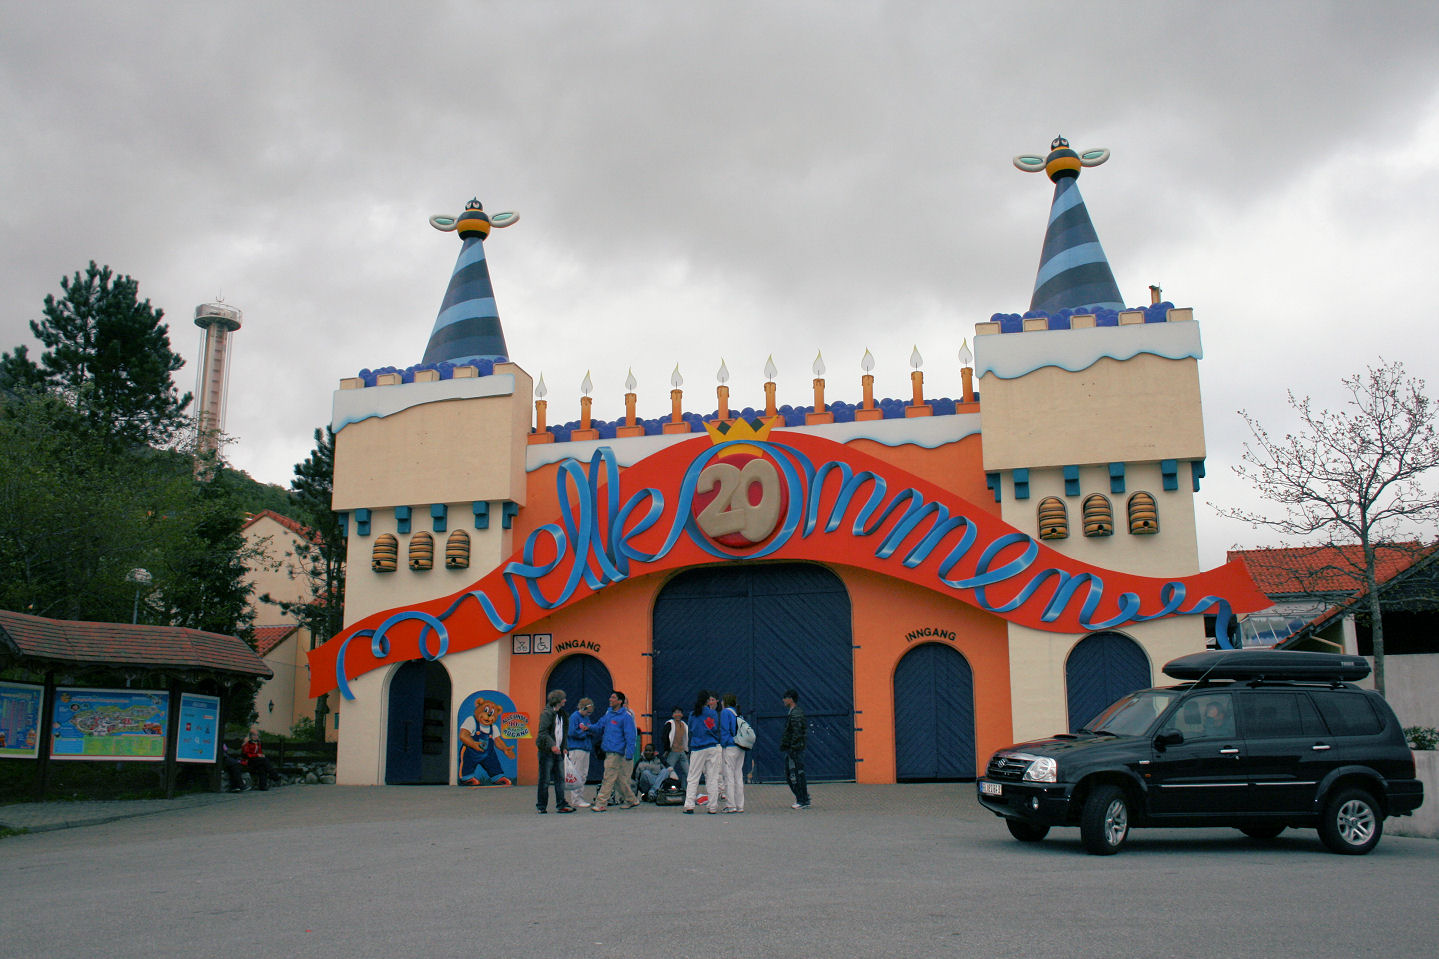 Luftskipet Kongeparken